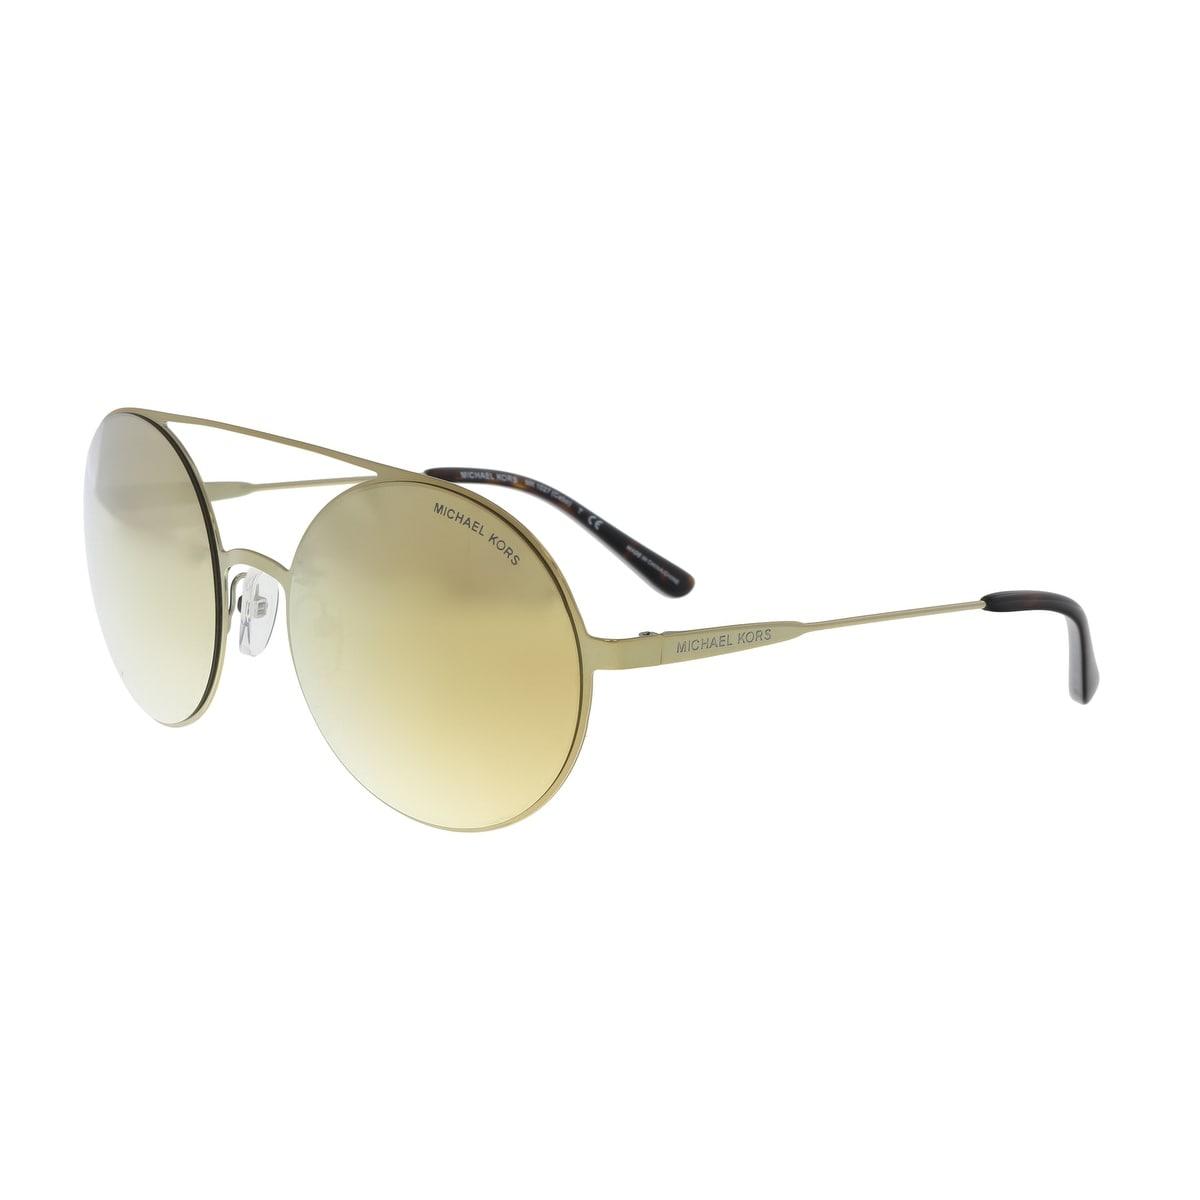 4f968d6cacb7 Shop Michael Kors MK1027 11937P Gold Round Sunglasses - No Size ...